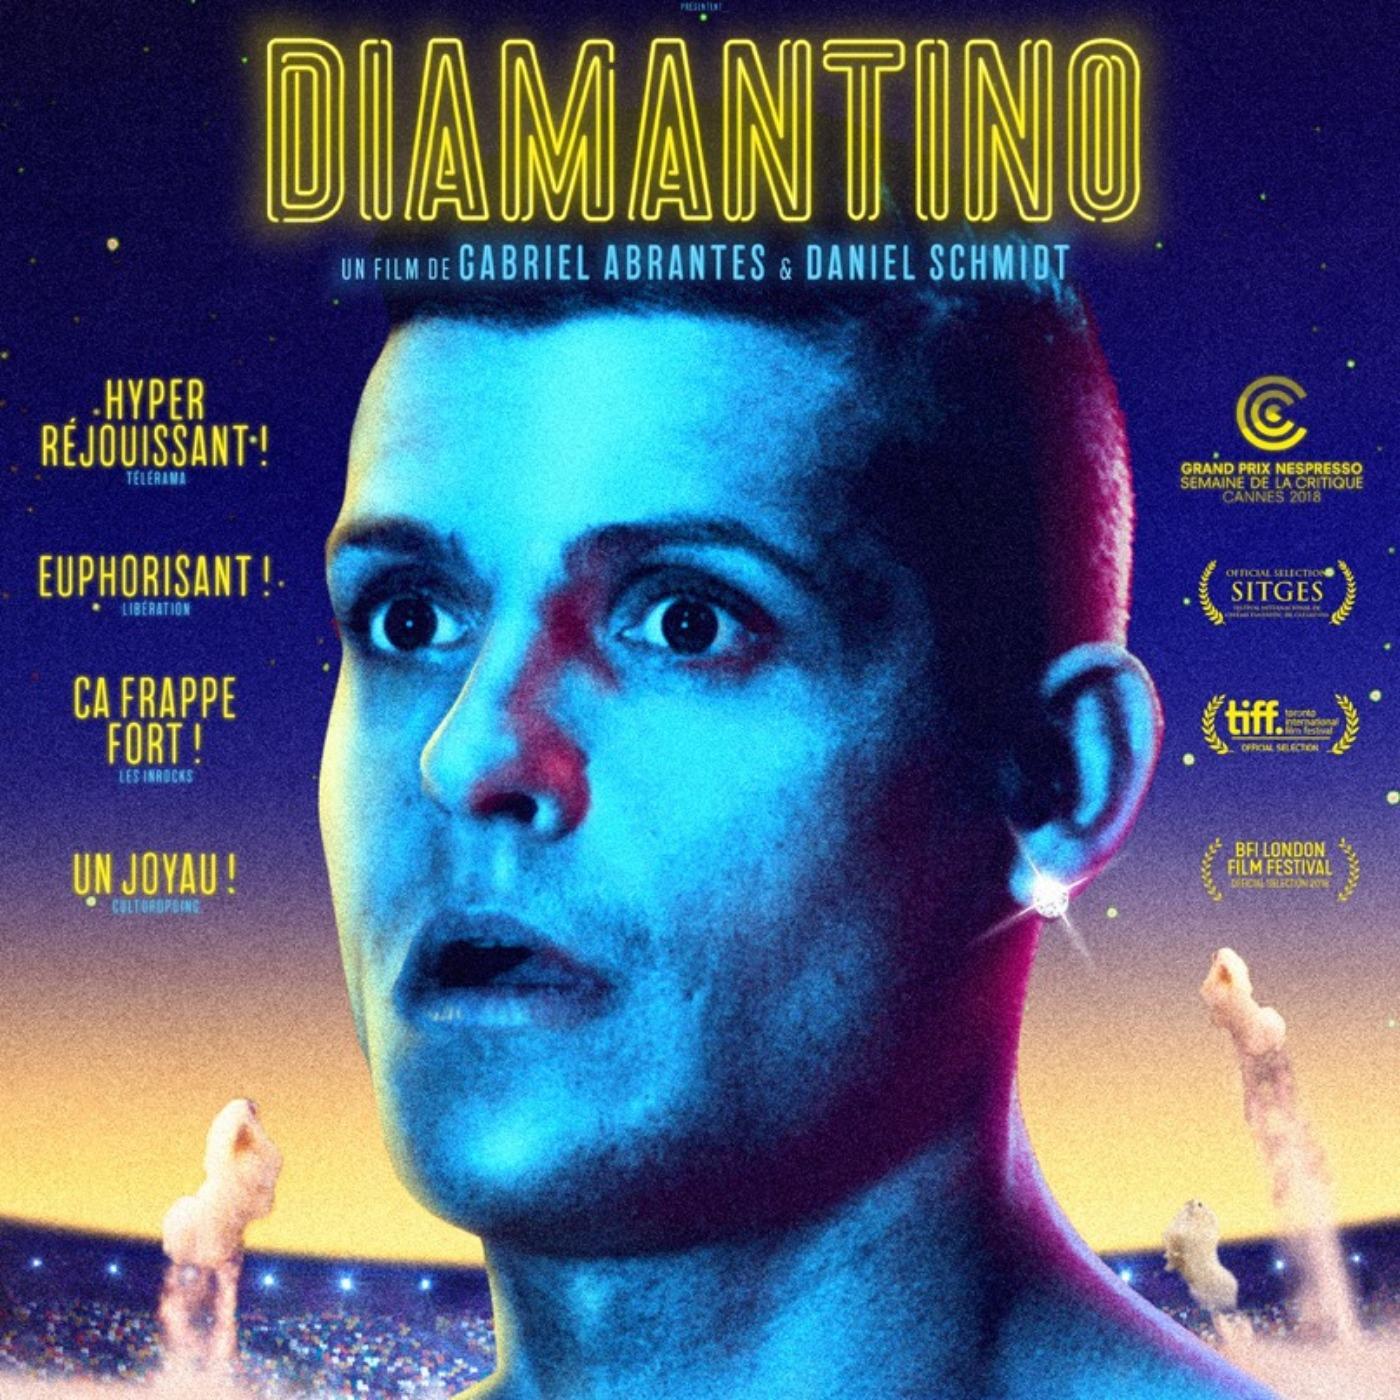 Ciné Parler #24 | Critique du film DIAMANTINO